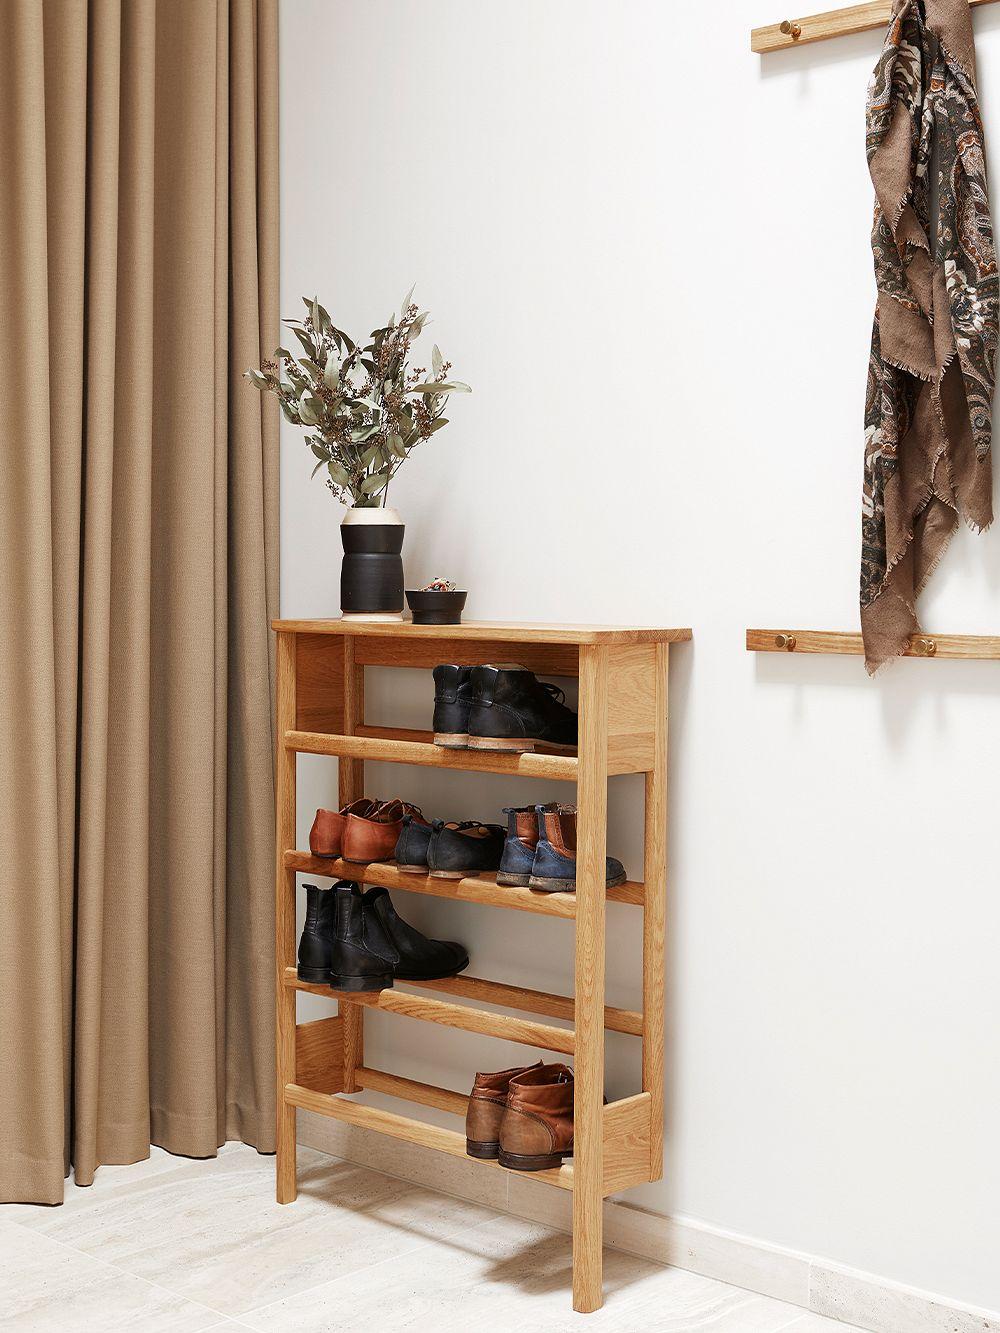 Form & Refine A Line shoe rack